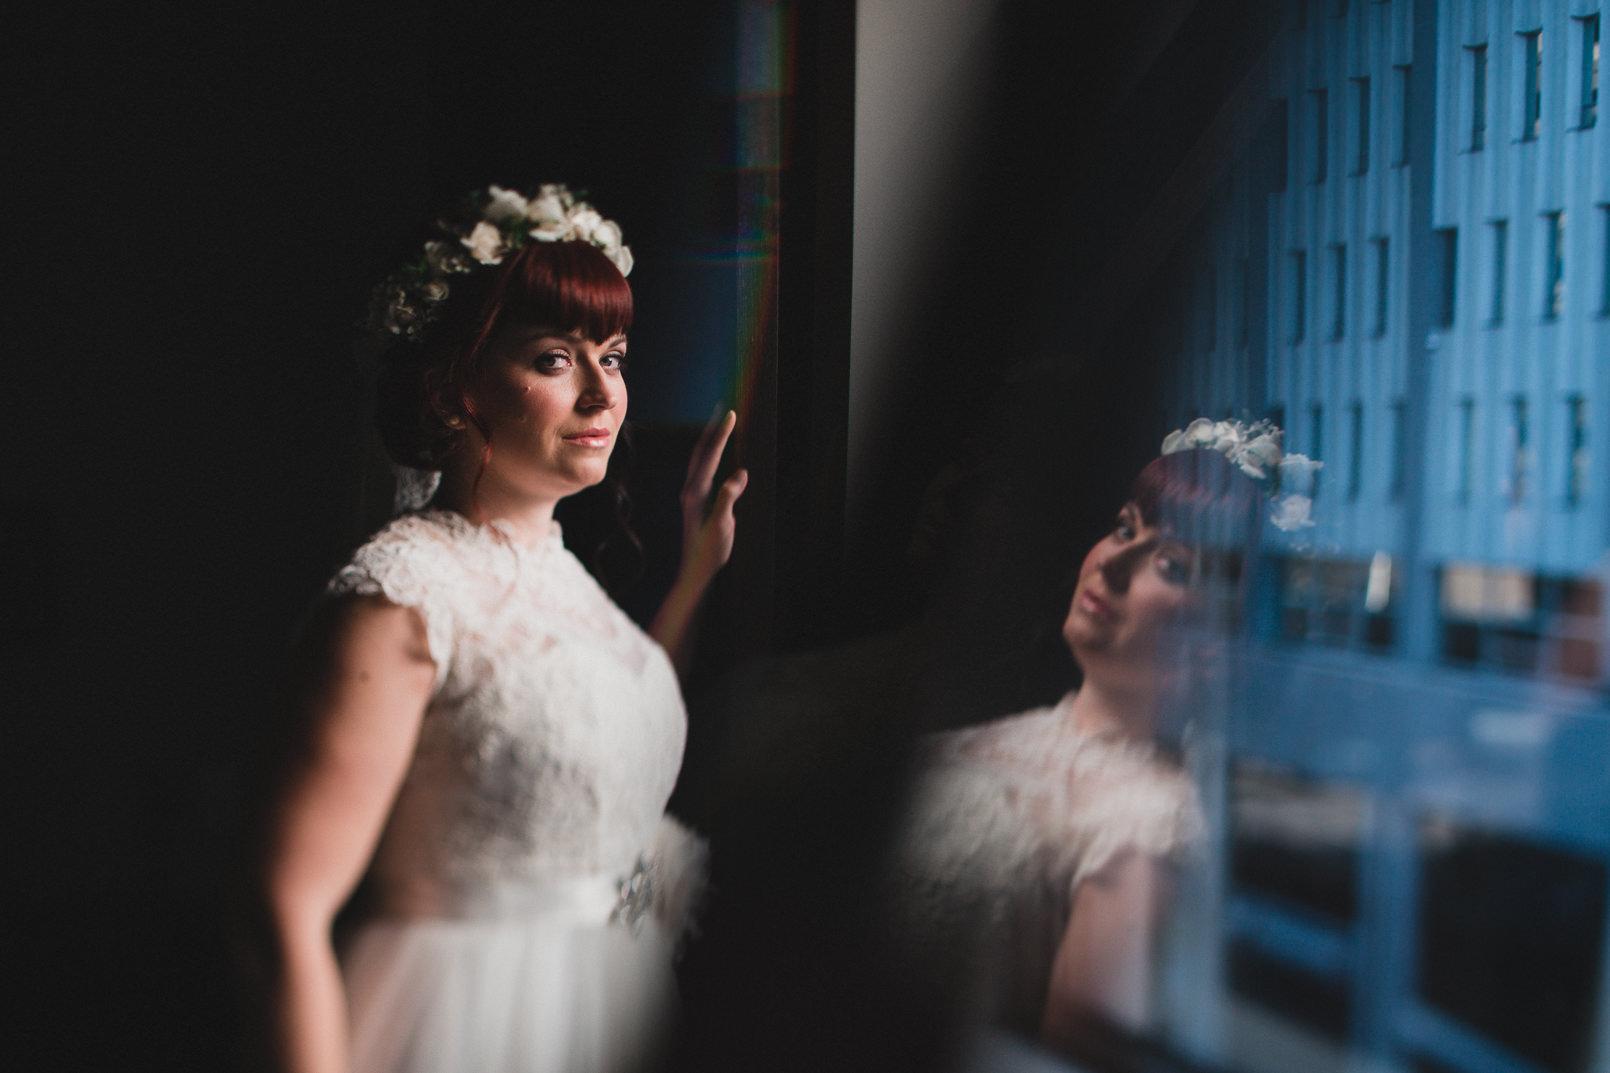 021-Jonathan-Kuhn-Photography-Wedding-_mini.jpg